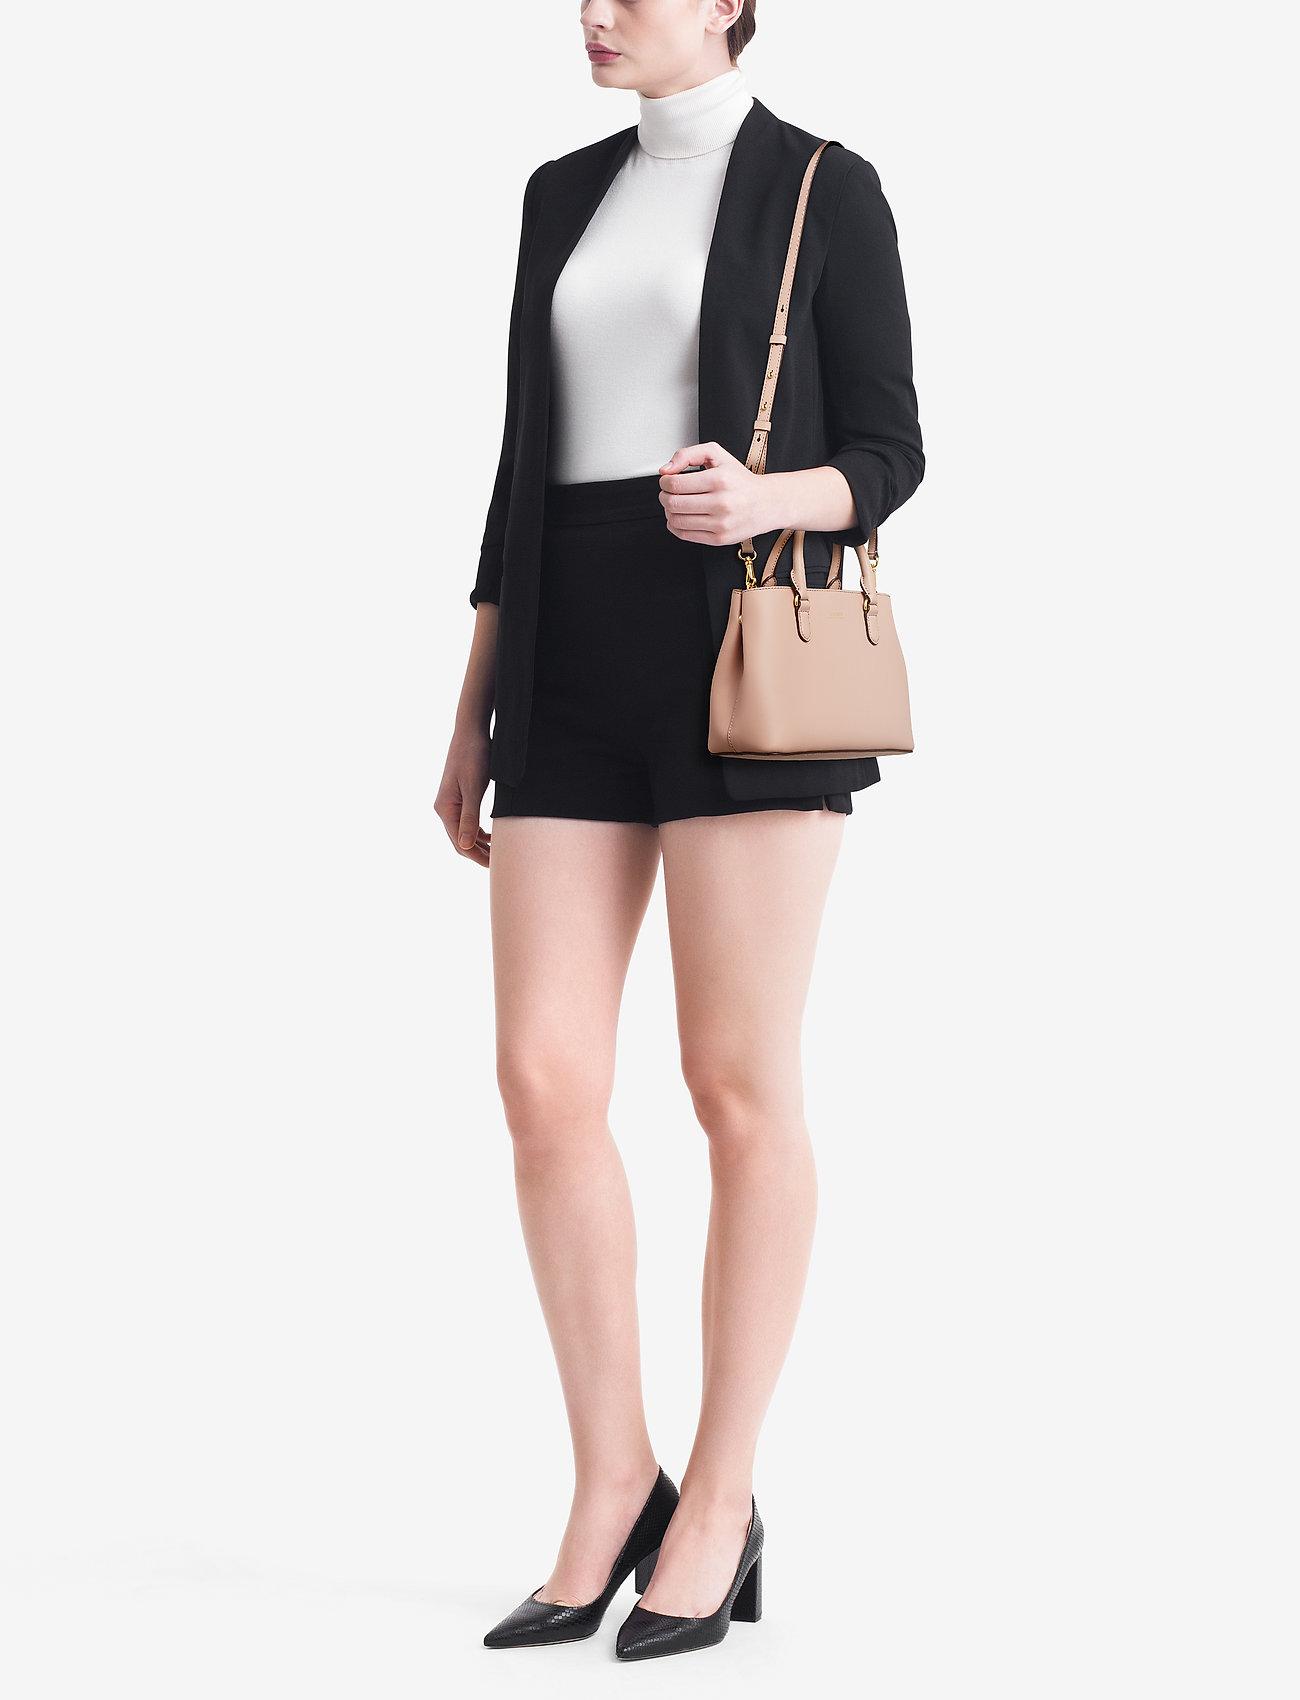 Lauren Ralph Lauren Mini Leather Satchel - MELLOW PINK/PORCI